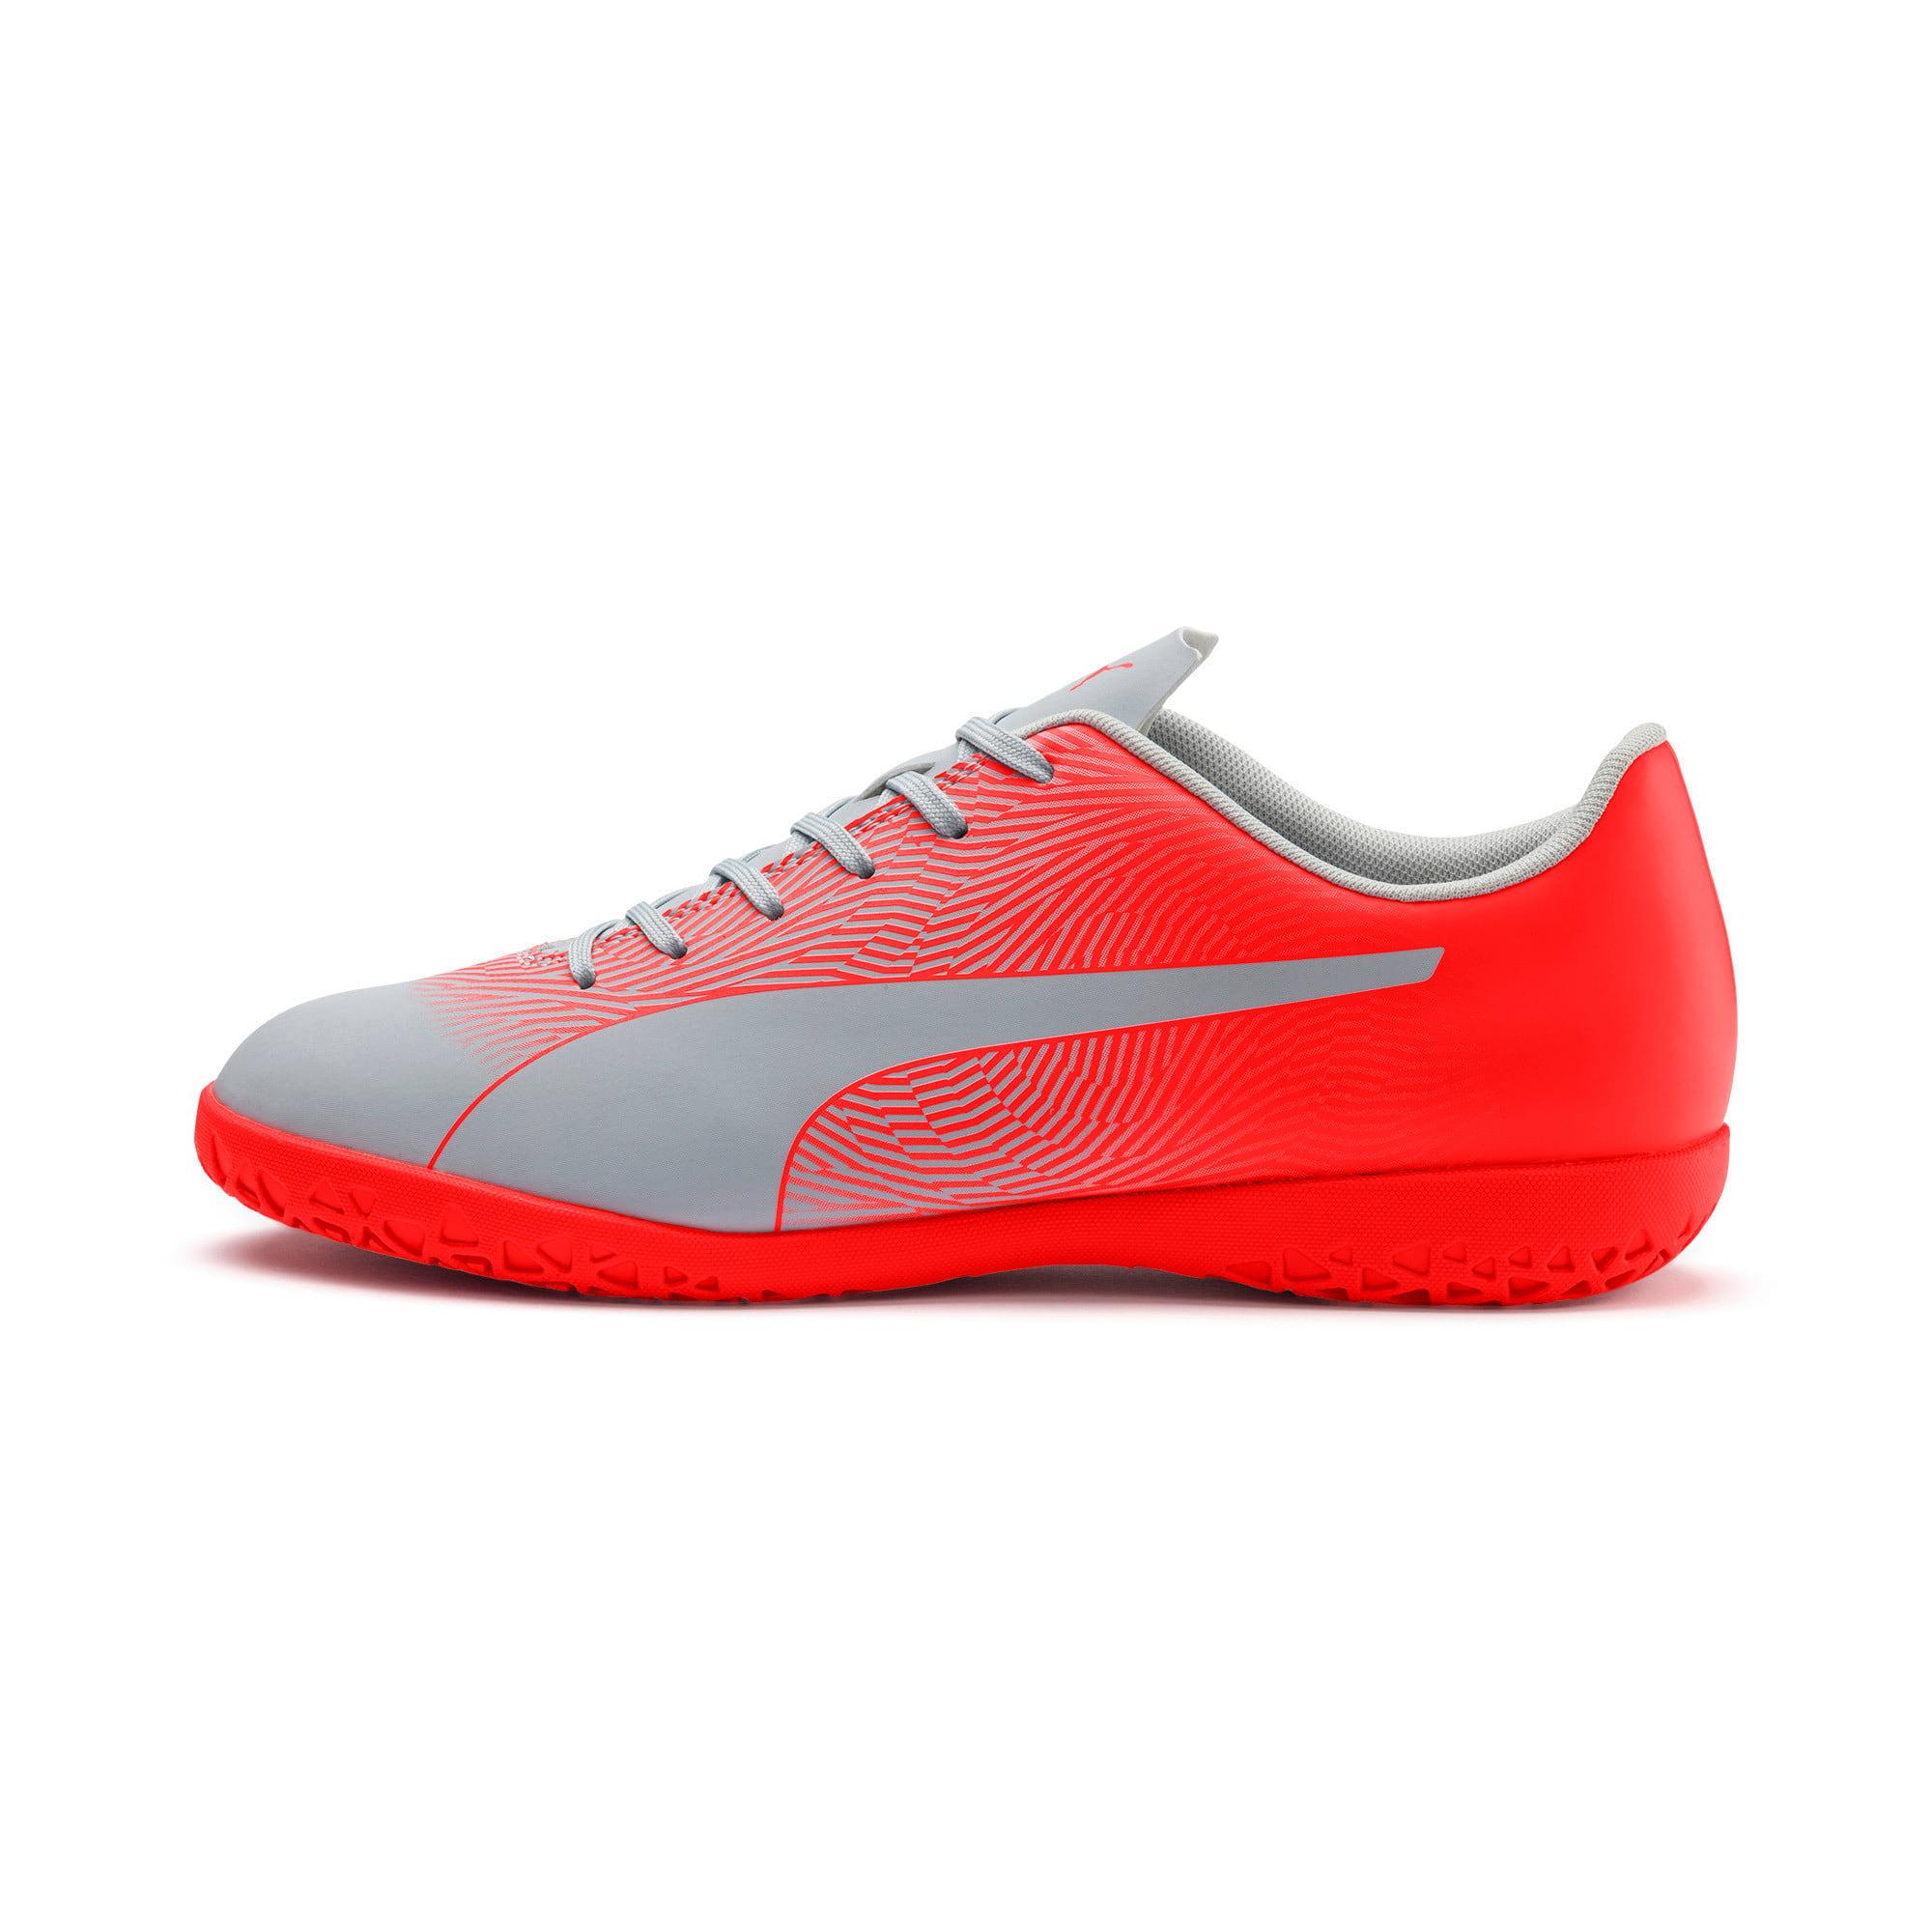 Thumbnail 1 of PUMA Spirit II IT Men's Soccer Shoes, Glacial Blue-Nrgy Red, medium